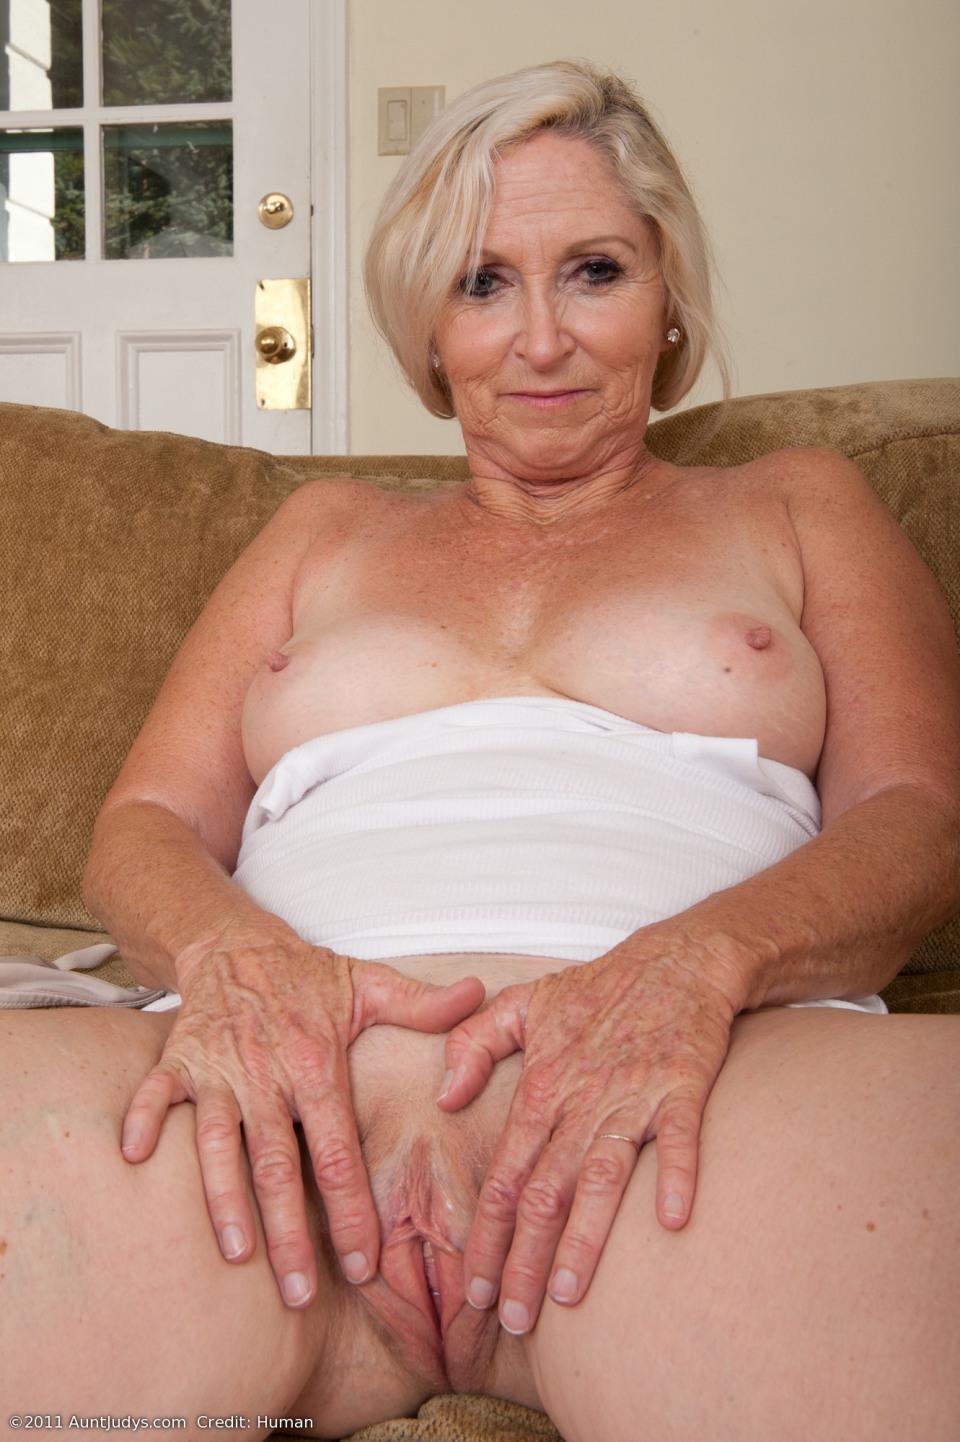 barefoot mature women Aunt nude judy